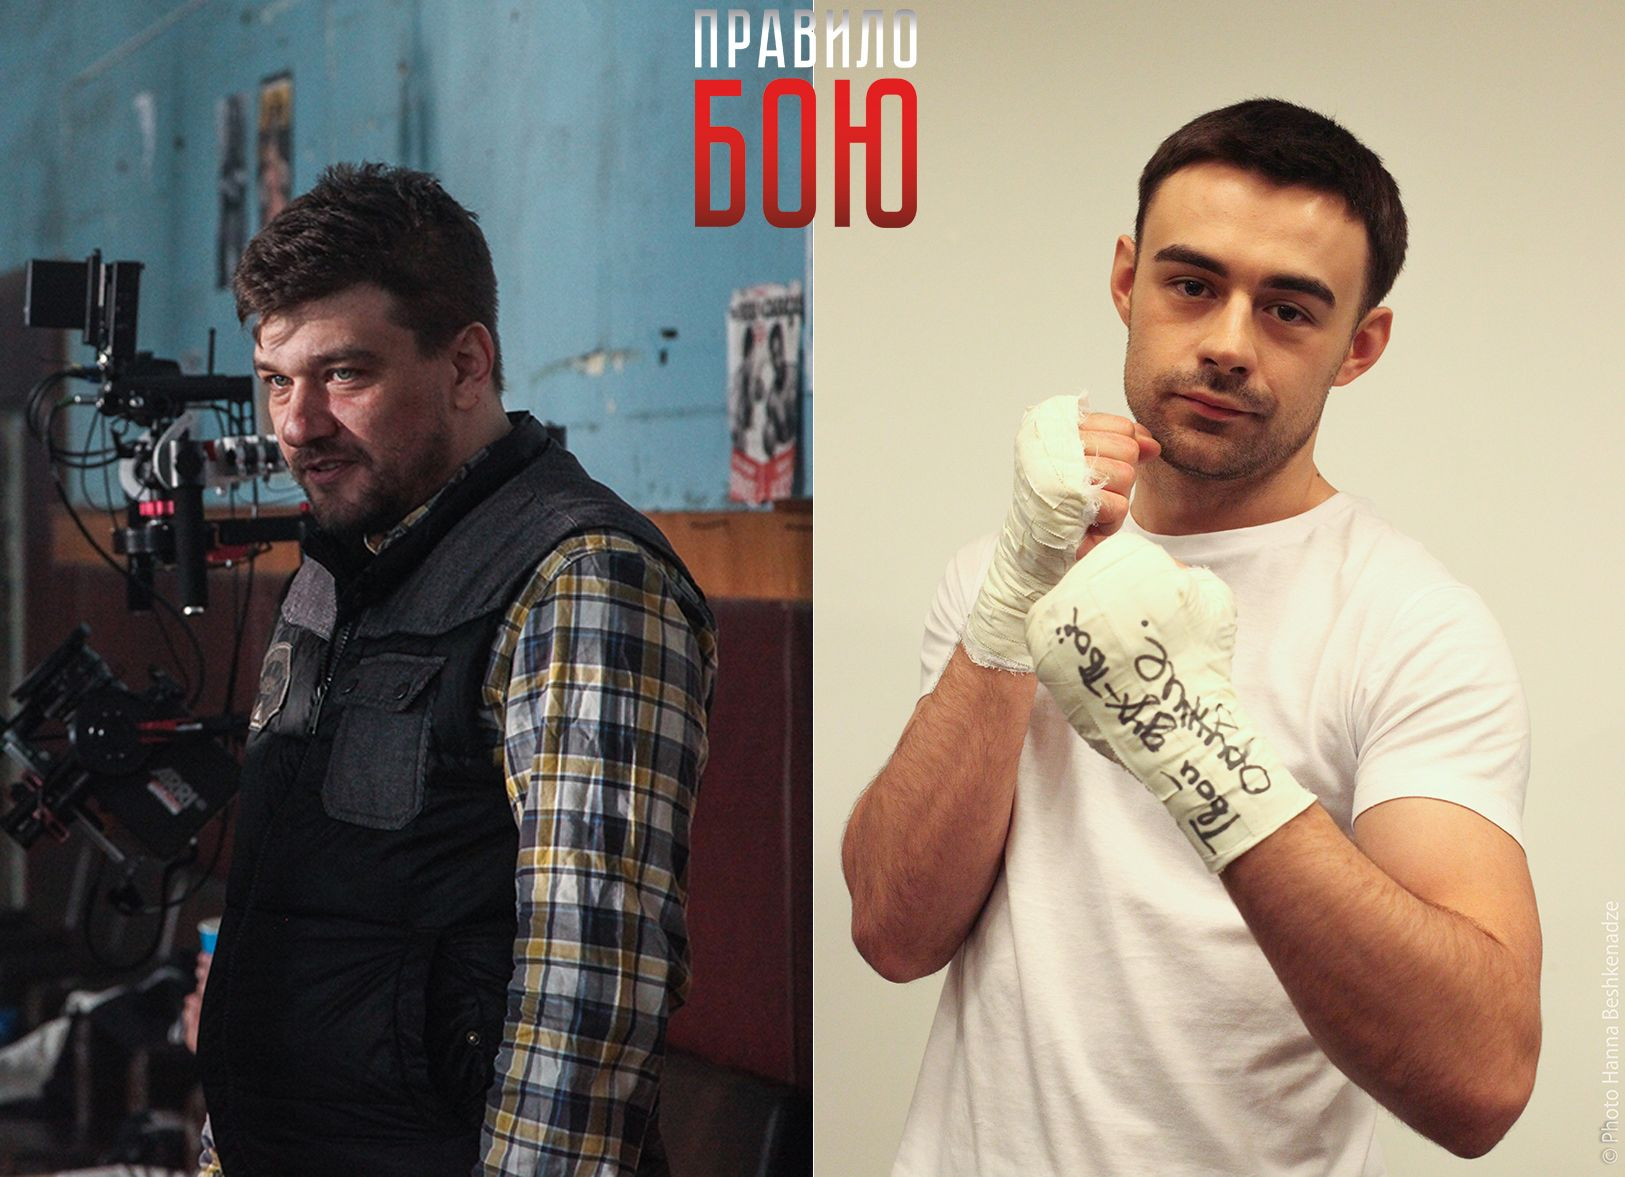 Режиссер Алексей Шапарев и актер Владислав Никитюк